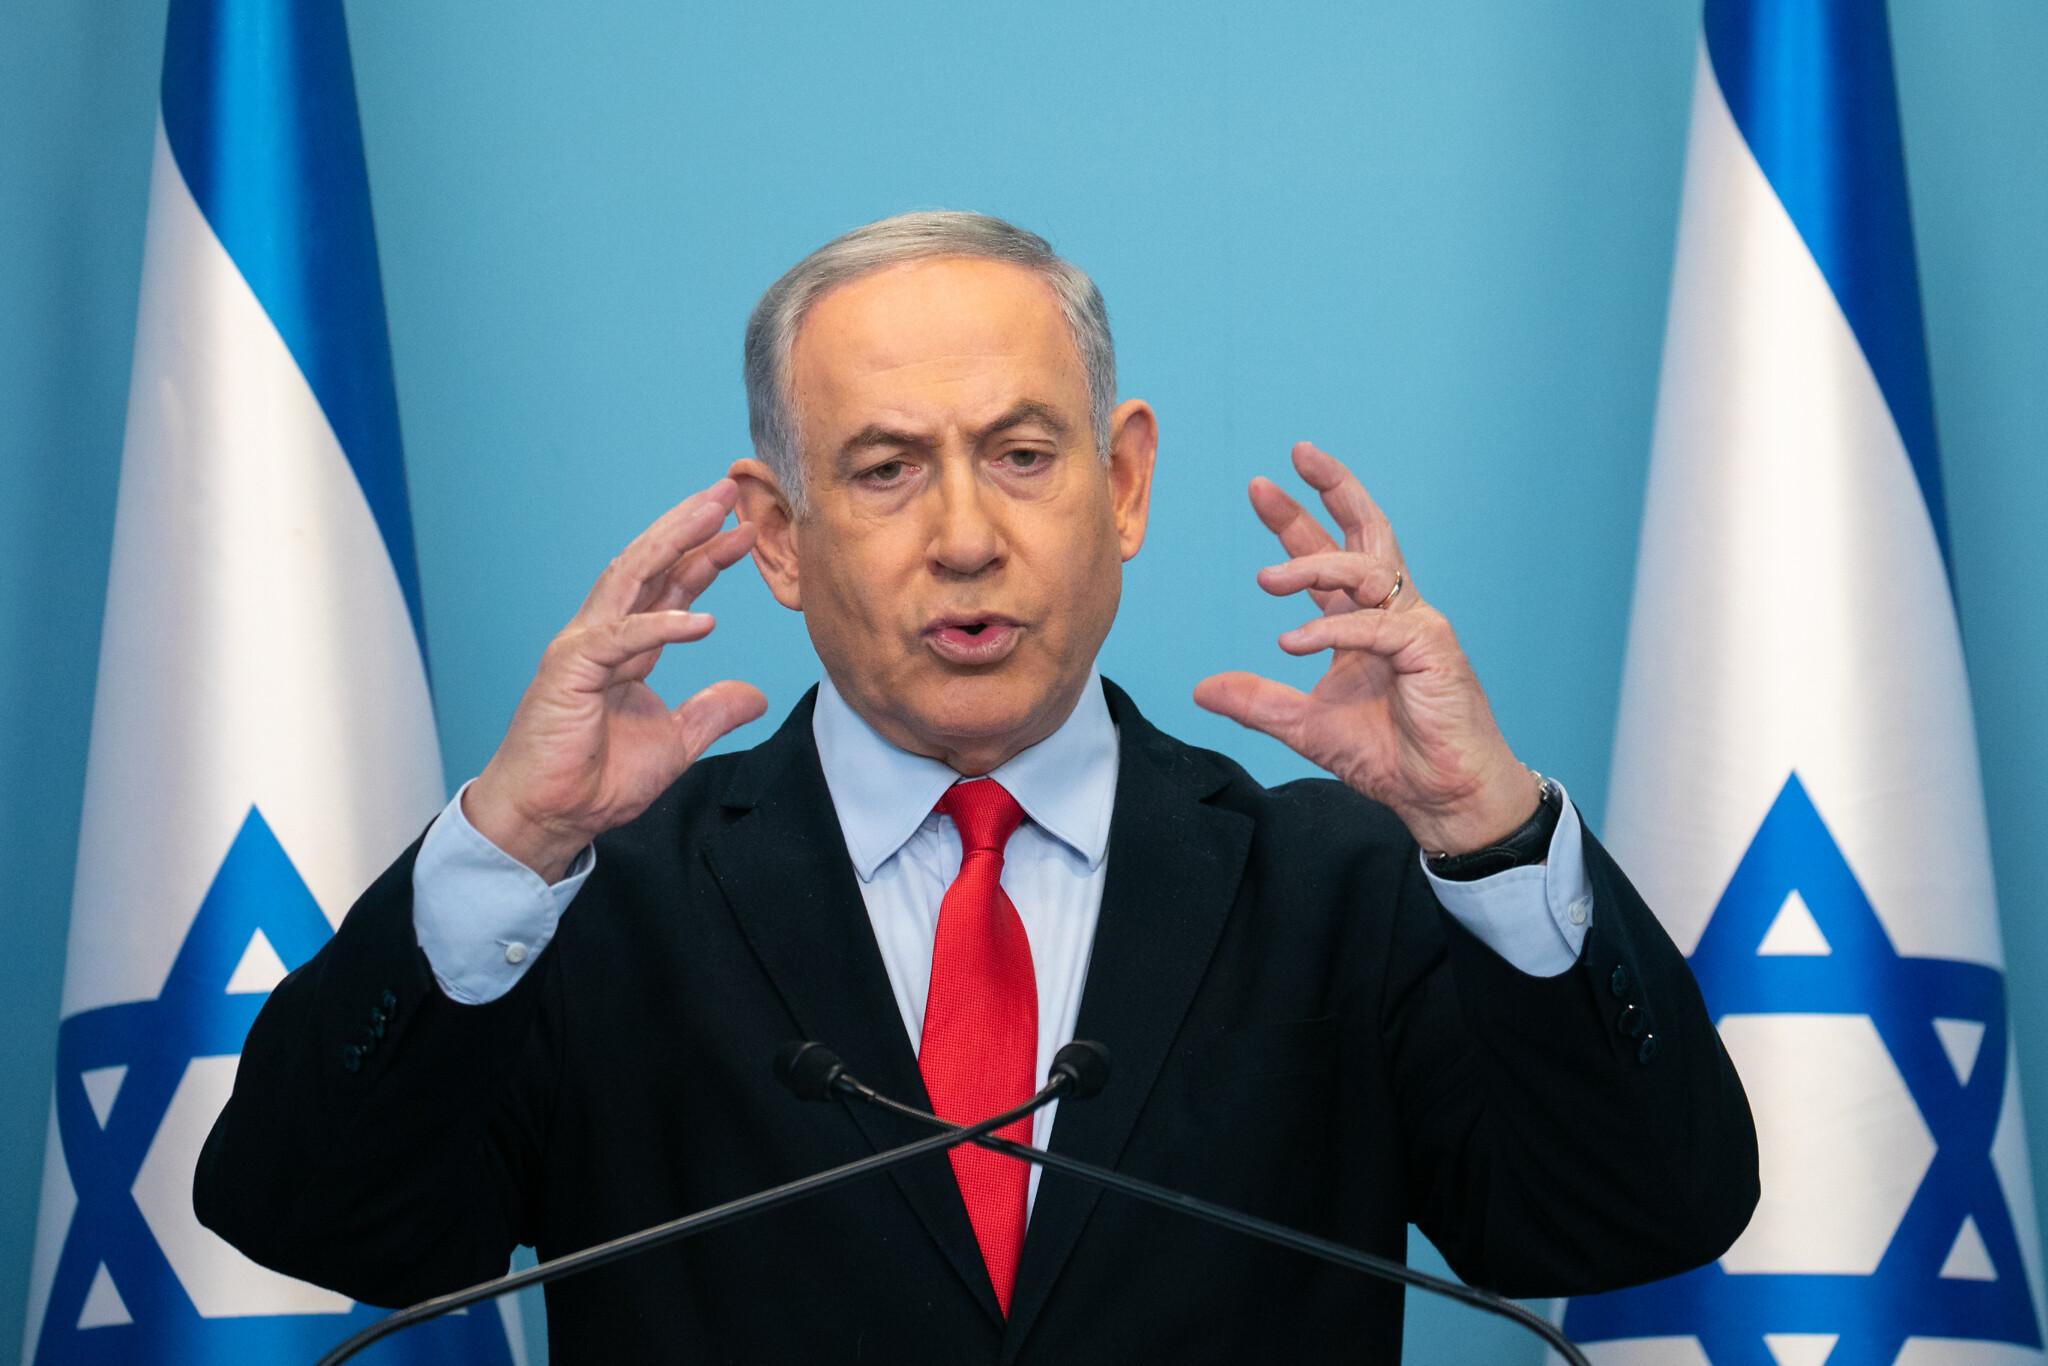 Coronavirus crisis delays start of Netanyahu corruption trial